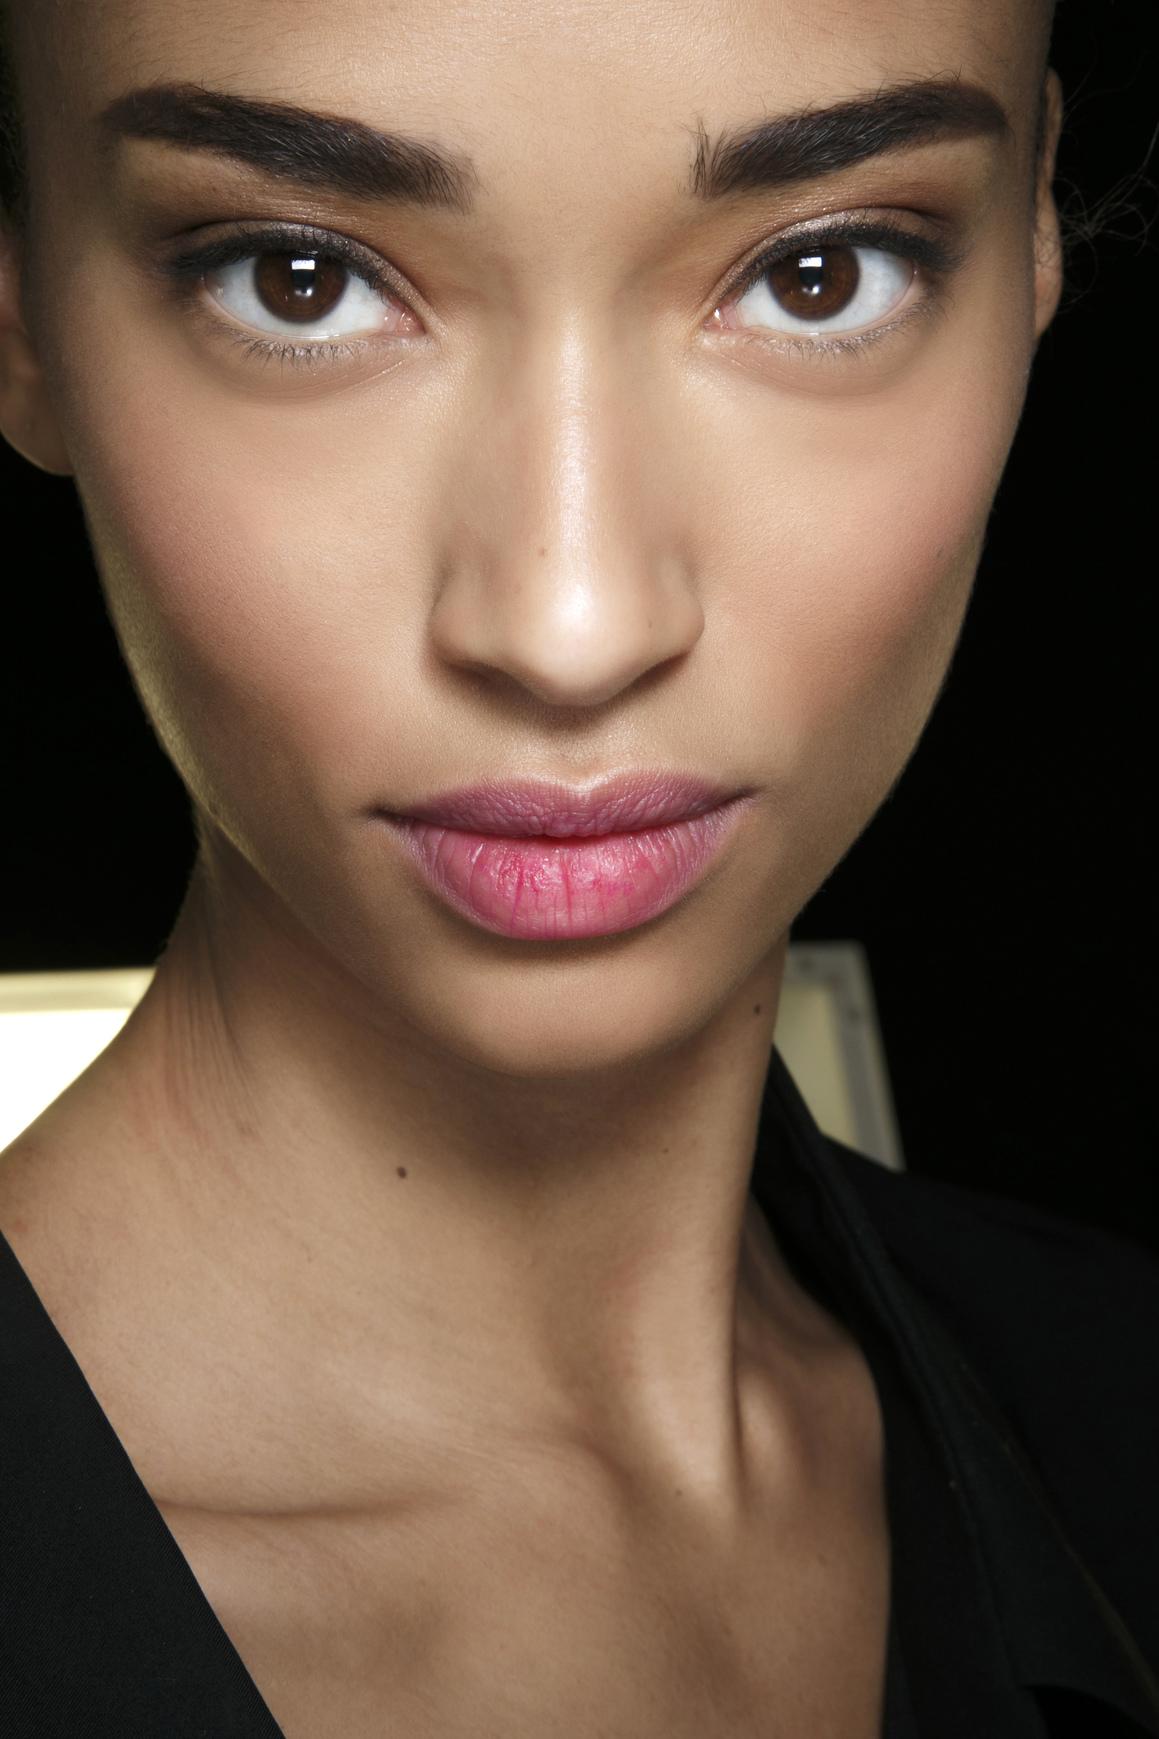 bold eyebrows